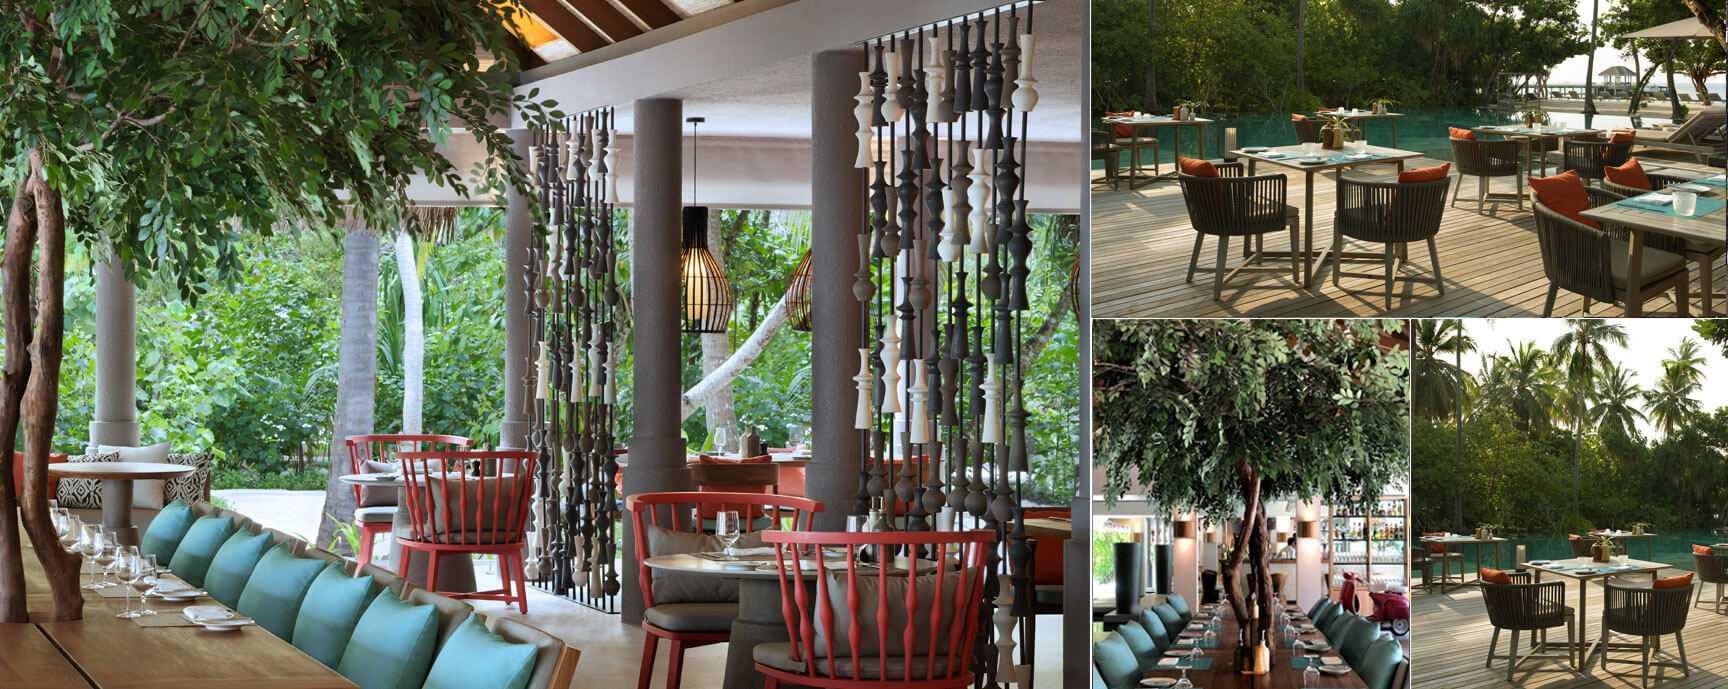 Vakkaru Resort Maldives - Isoletta Restaurant